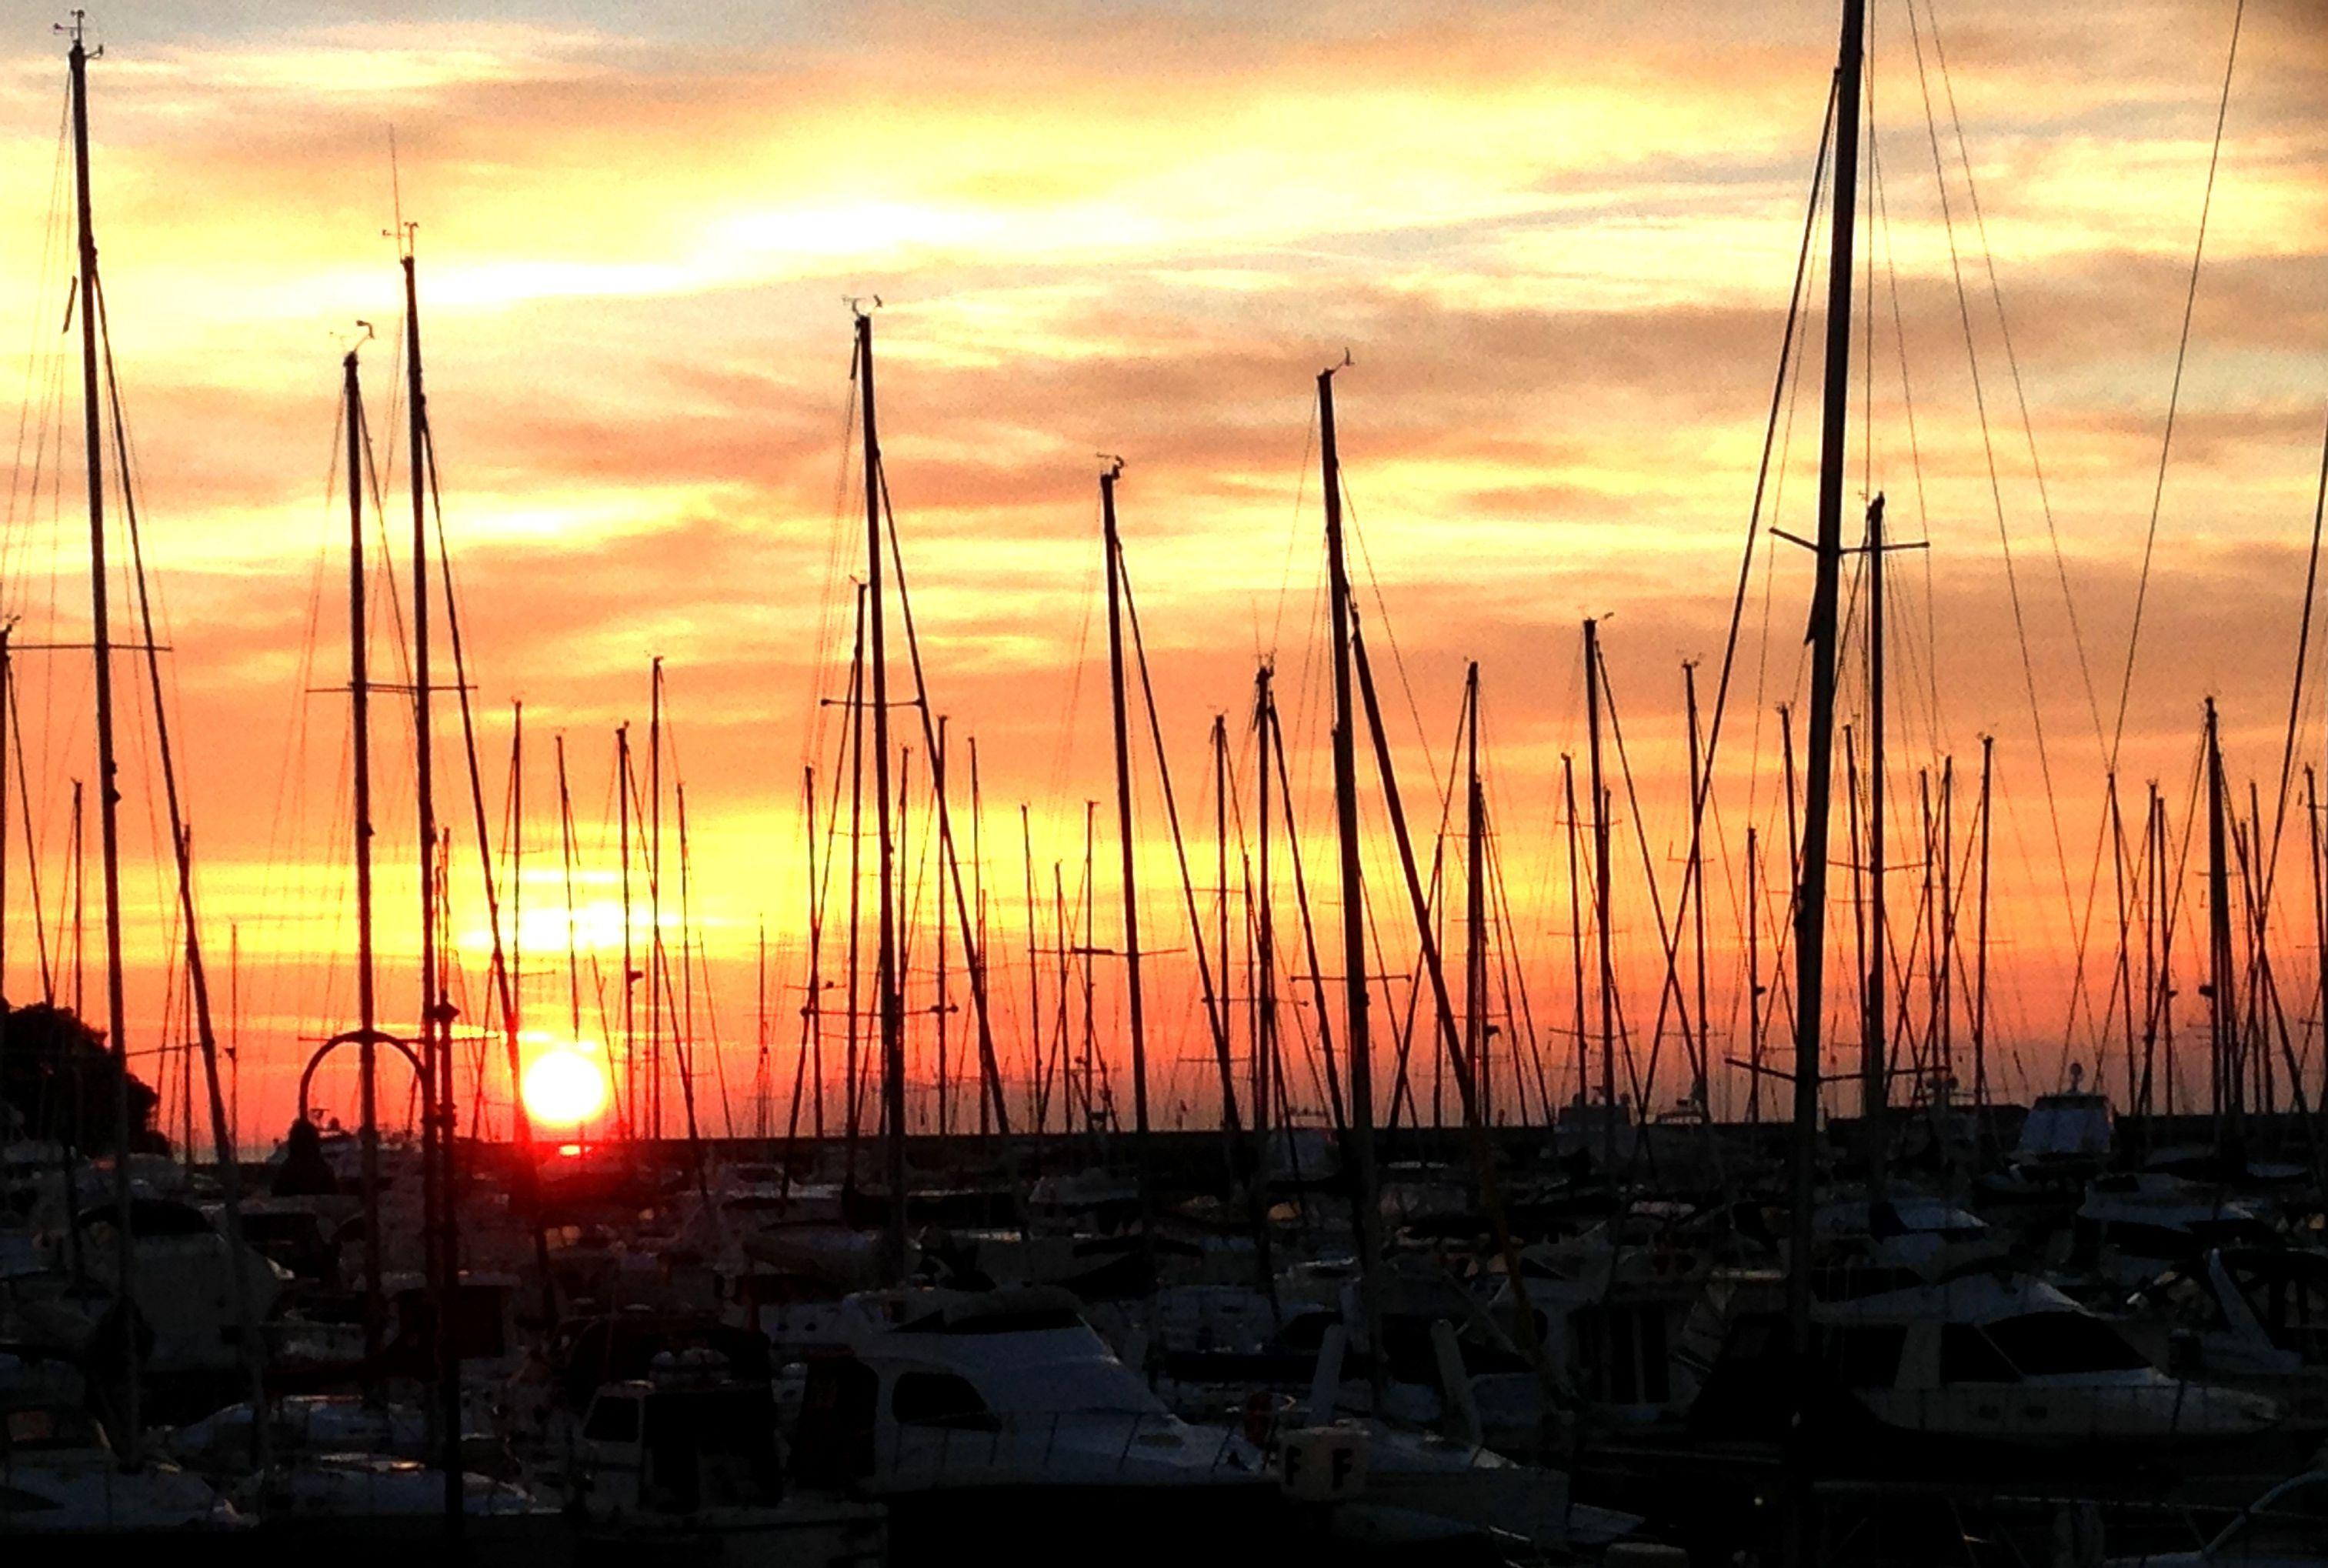 #Sunset at Marina di Scarlino #Maremma #Tuscamy